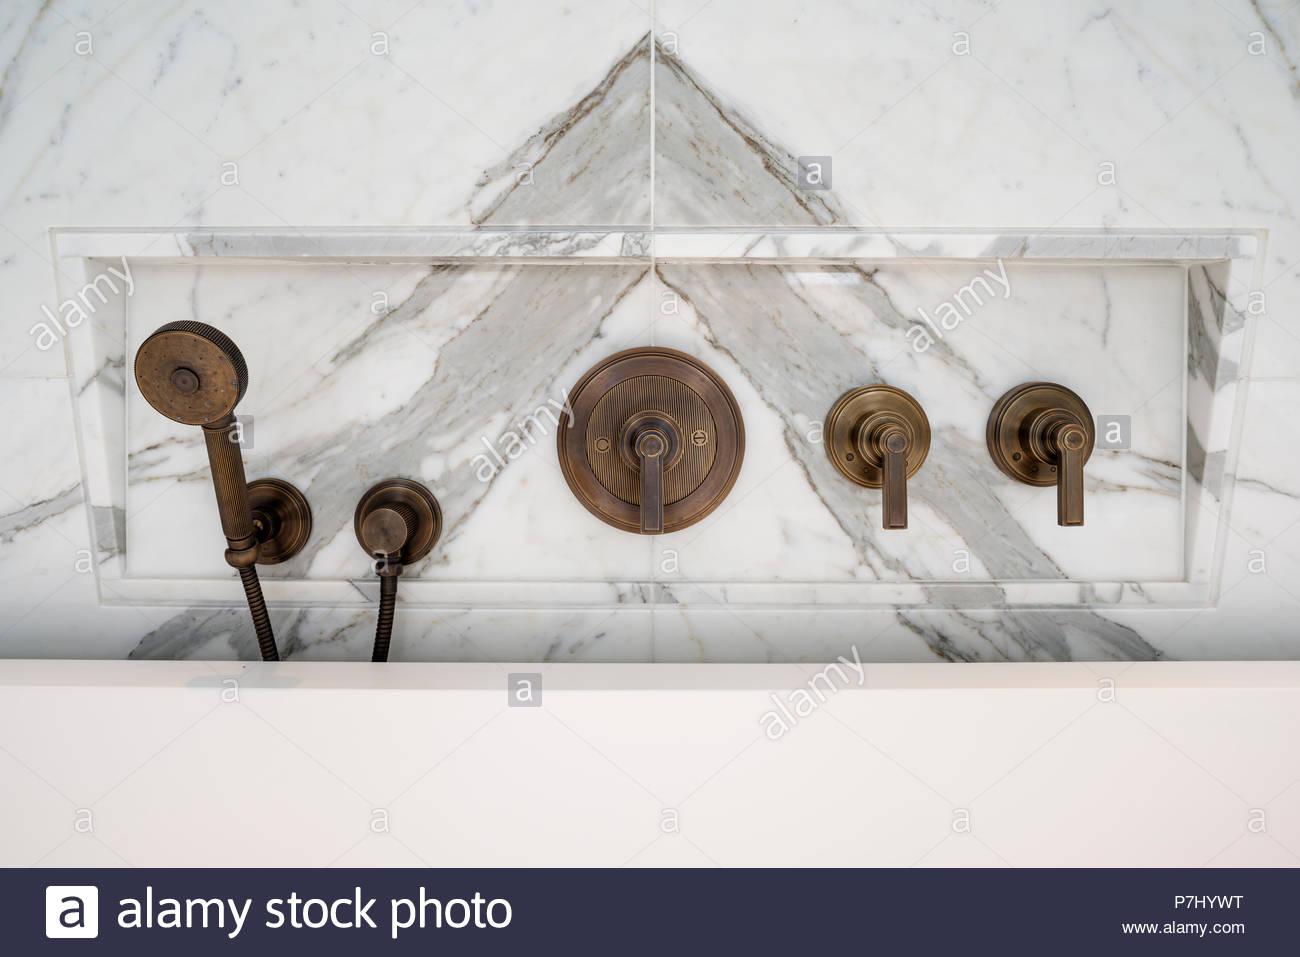 Metal taps by bathtub - Stock Image